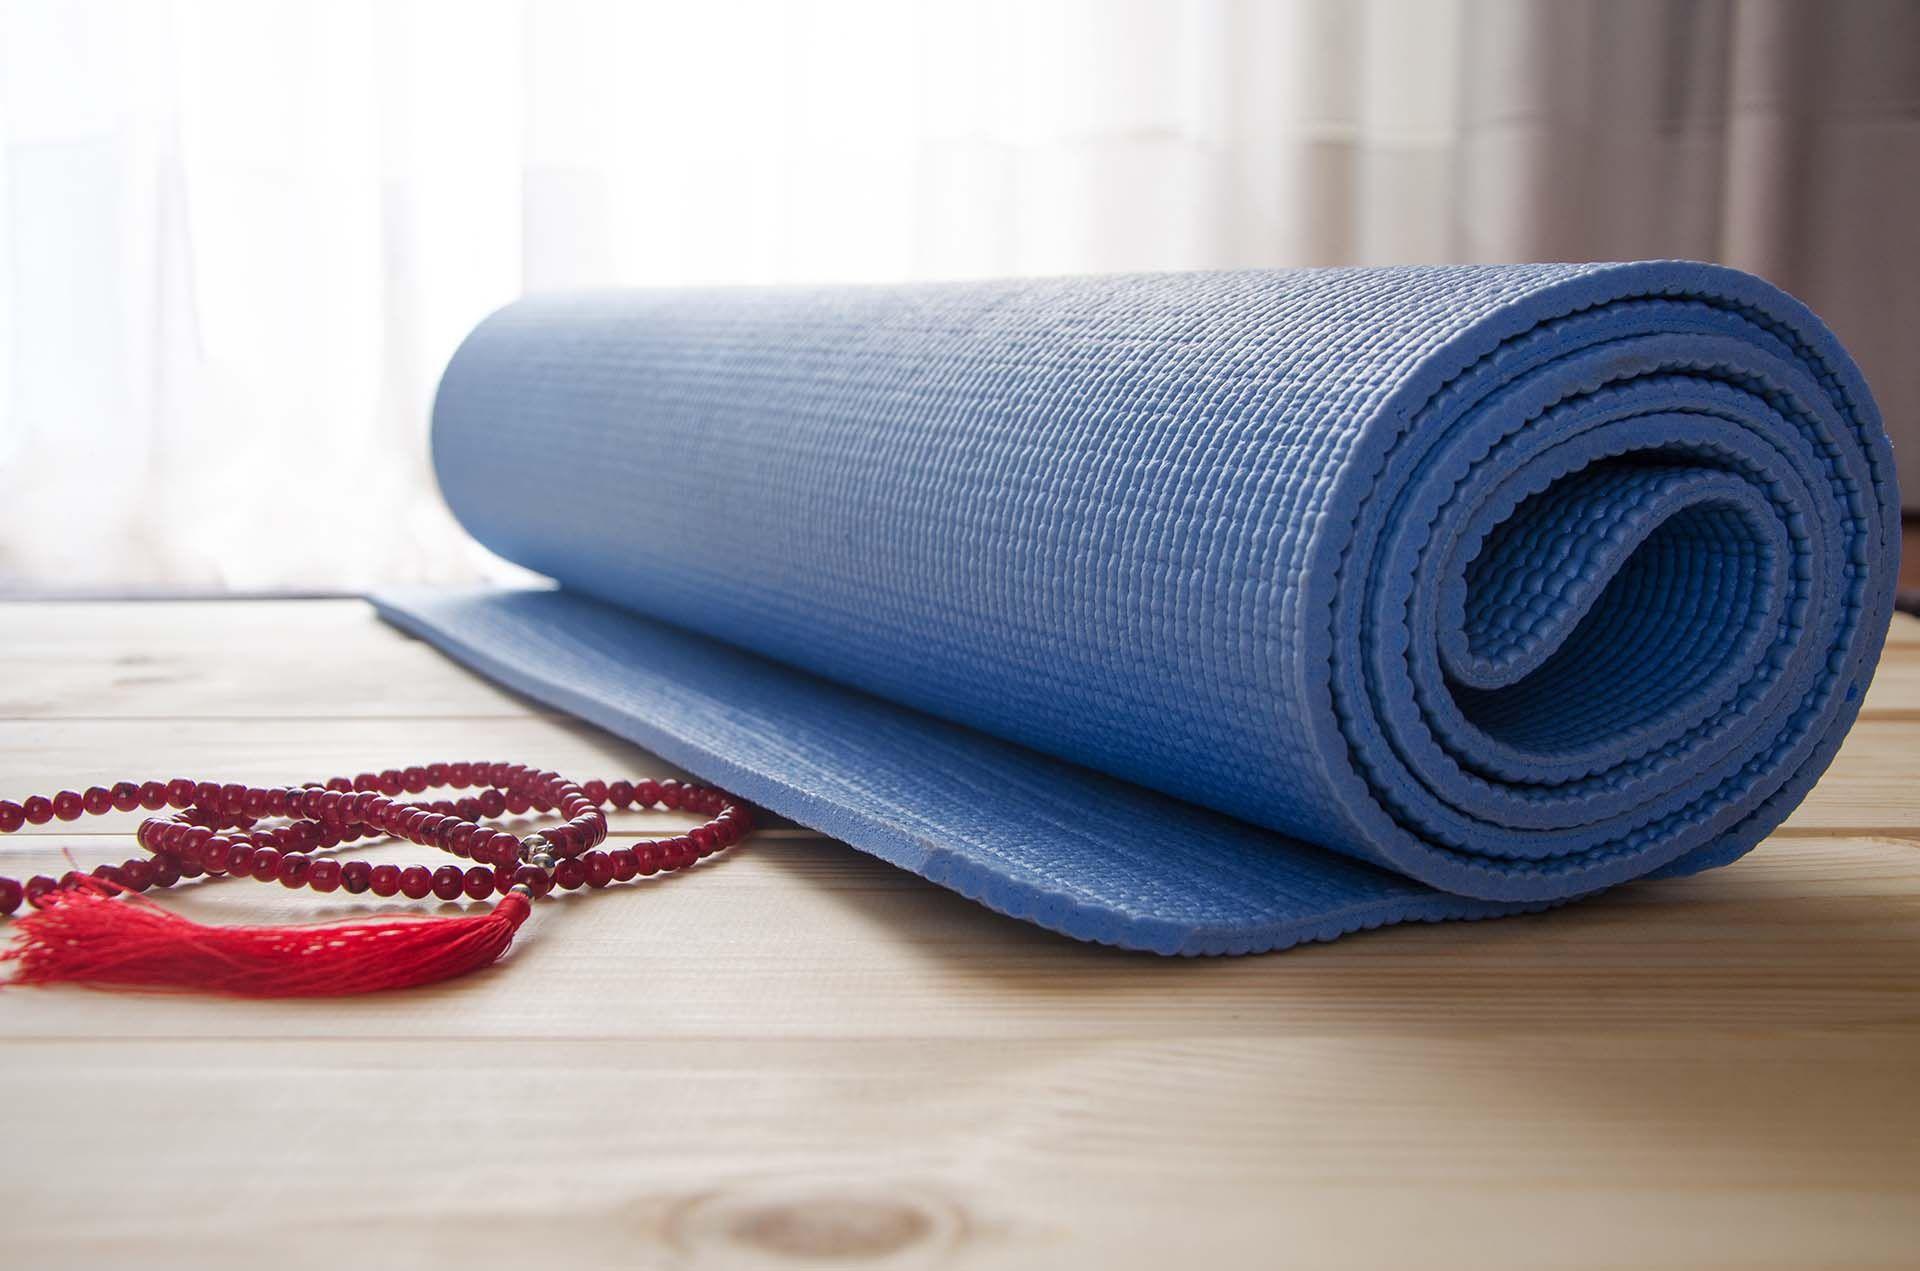 bigstock-Yoga-Mat-With-Mala-Beads-153546827.jpg